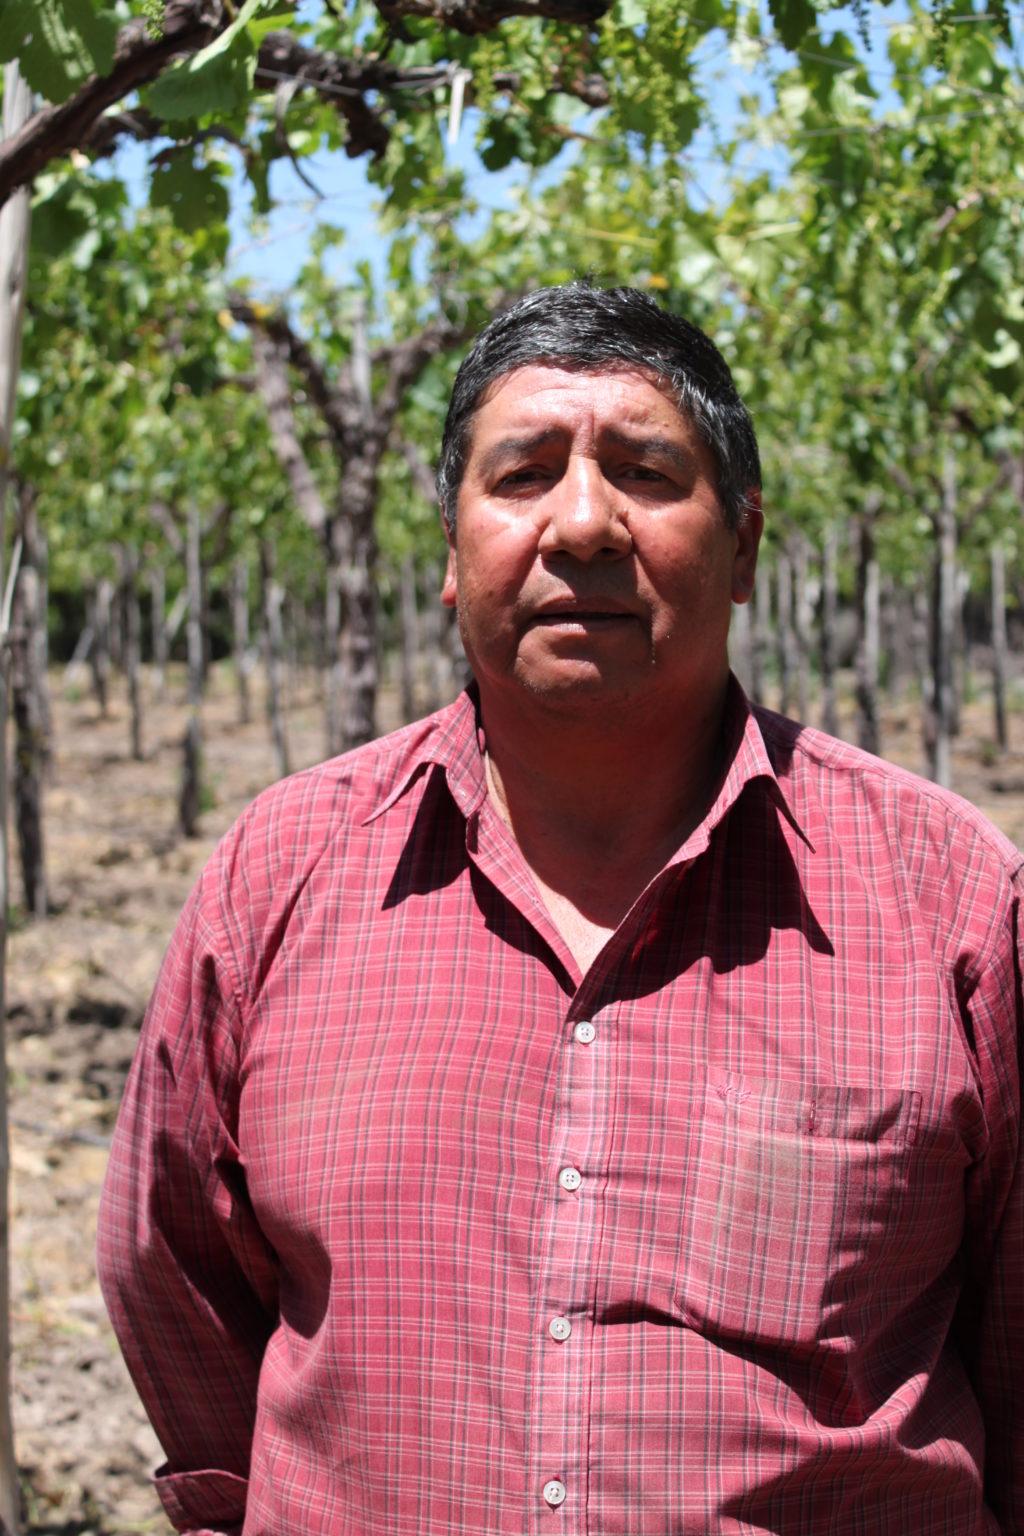 José Luis Lopez Espindola, Tafeltrauben-Produzent der Kooperative Mi Fruta